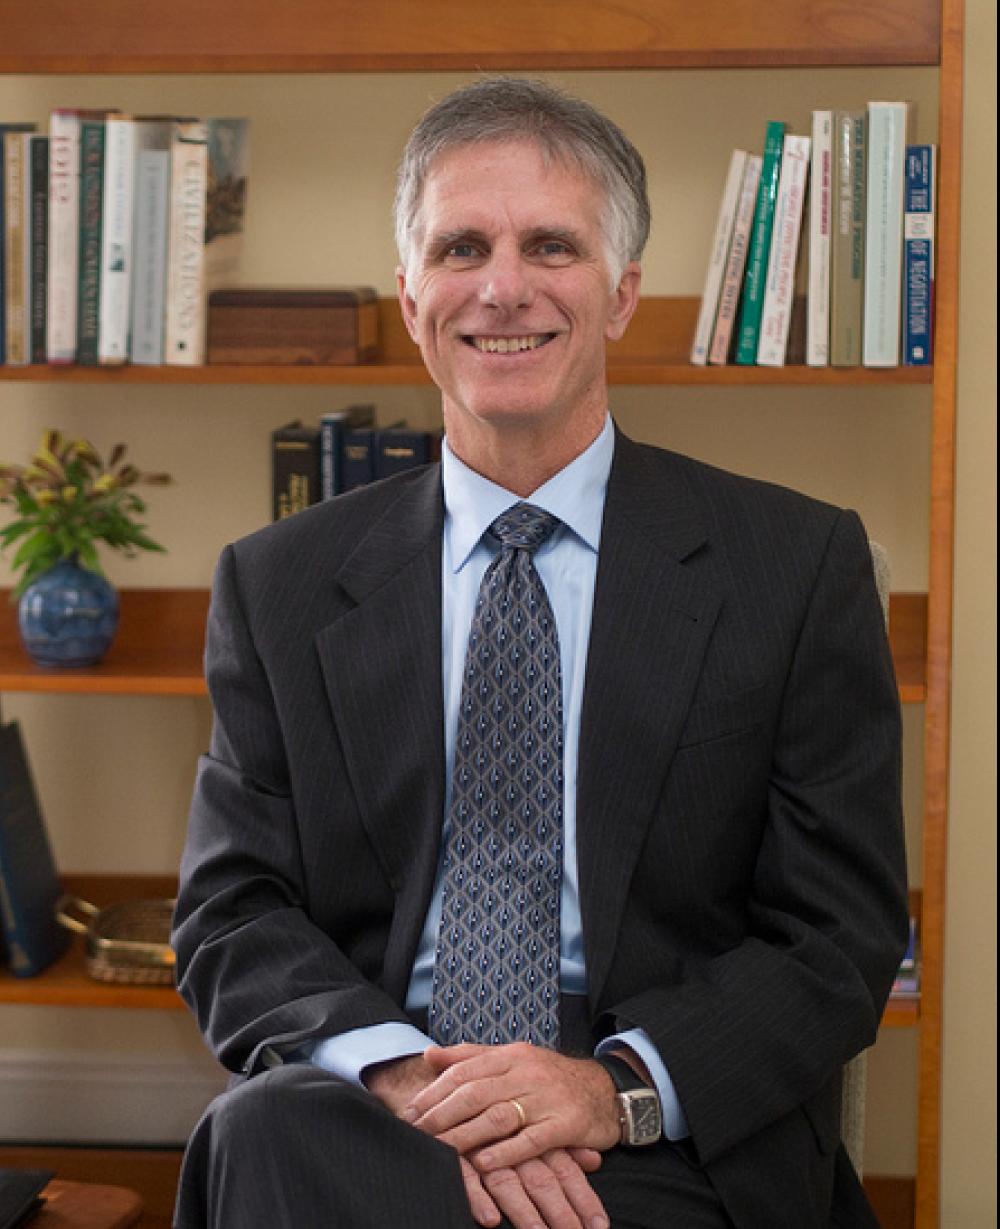 Paul Roose, Arbitrator & Mediator